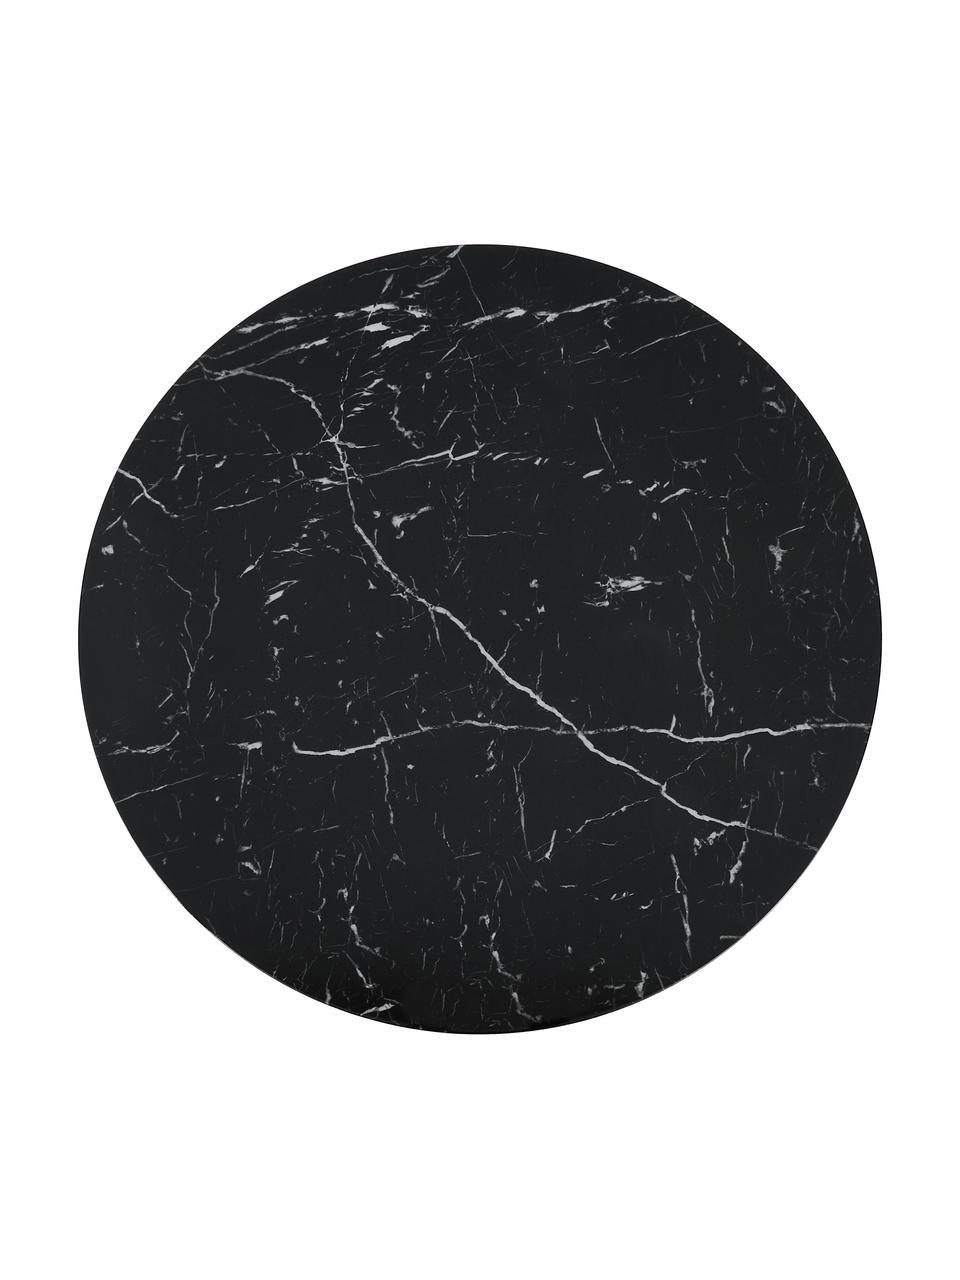 Tavolo rotondo effetto marmo nero Karla, Ø 90 cm, Nero effetto marmo, Ø 90 x Alt. 75 cm